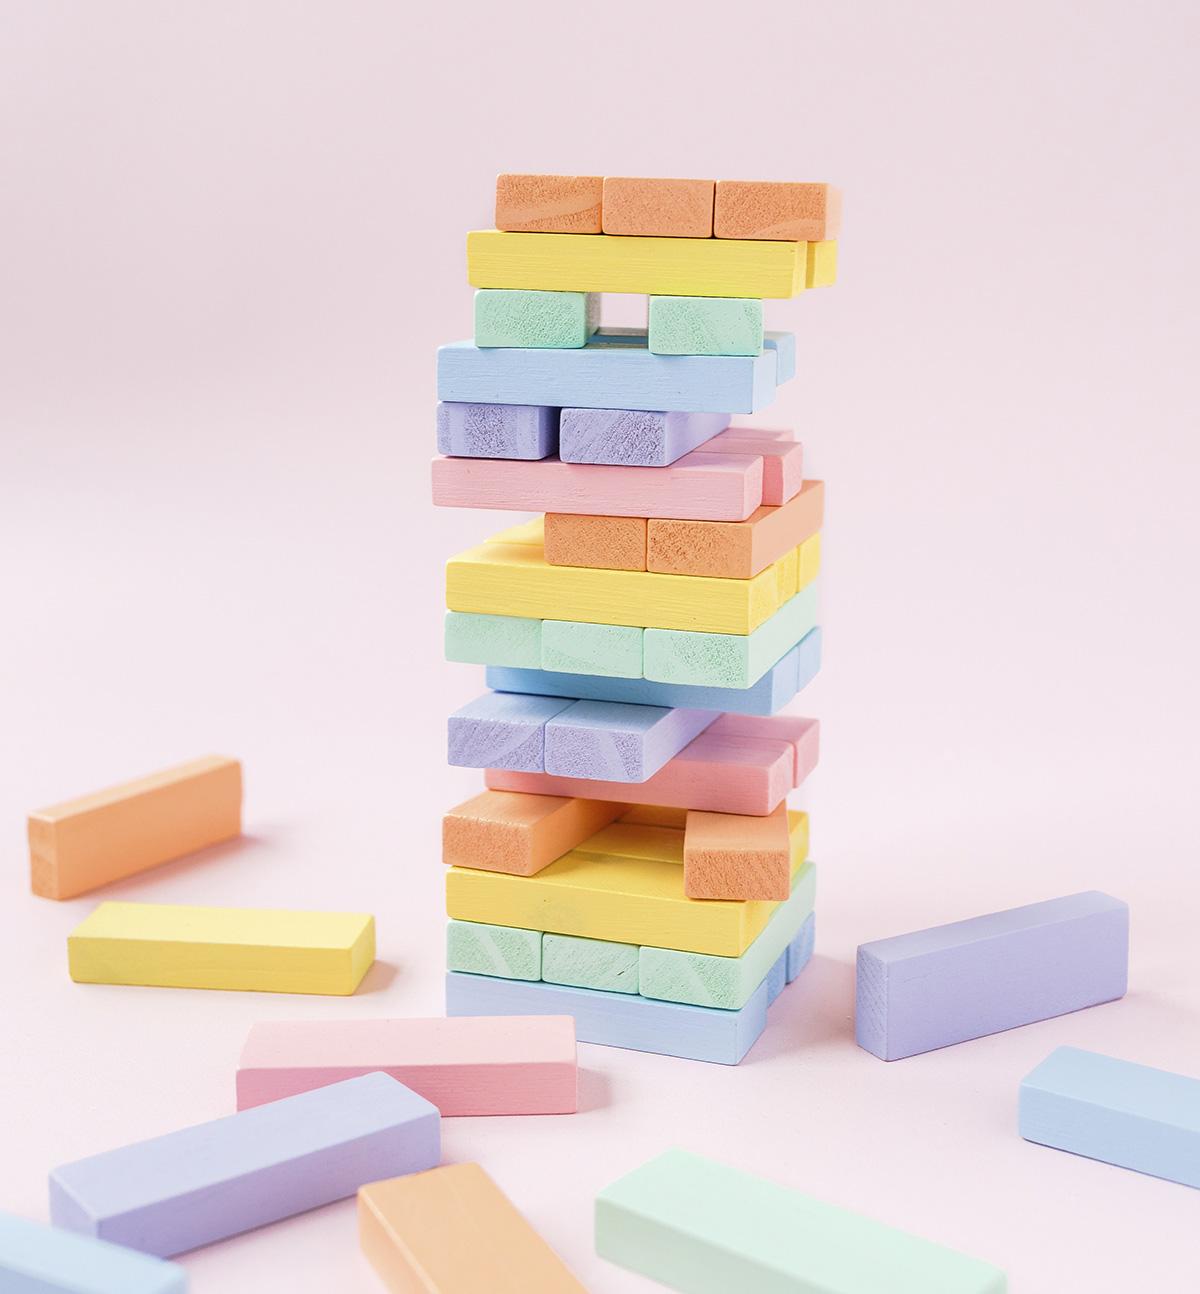 missredfox - 12giftswithlovegoesxmas - 14 - Kathy Loves - Wackelturm aus Holz DIY Kinderspielzeug - Bauklötze selber machen 2